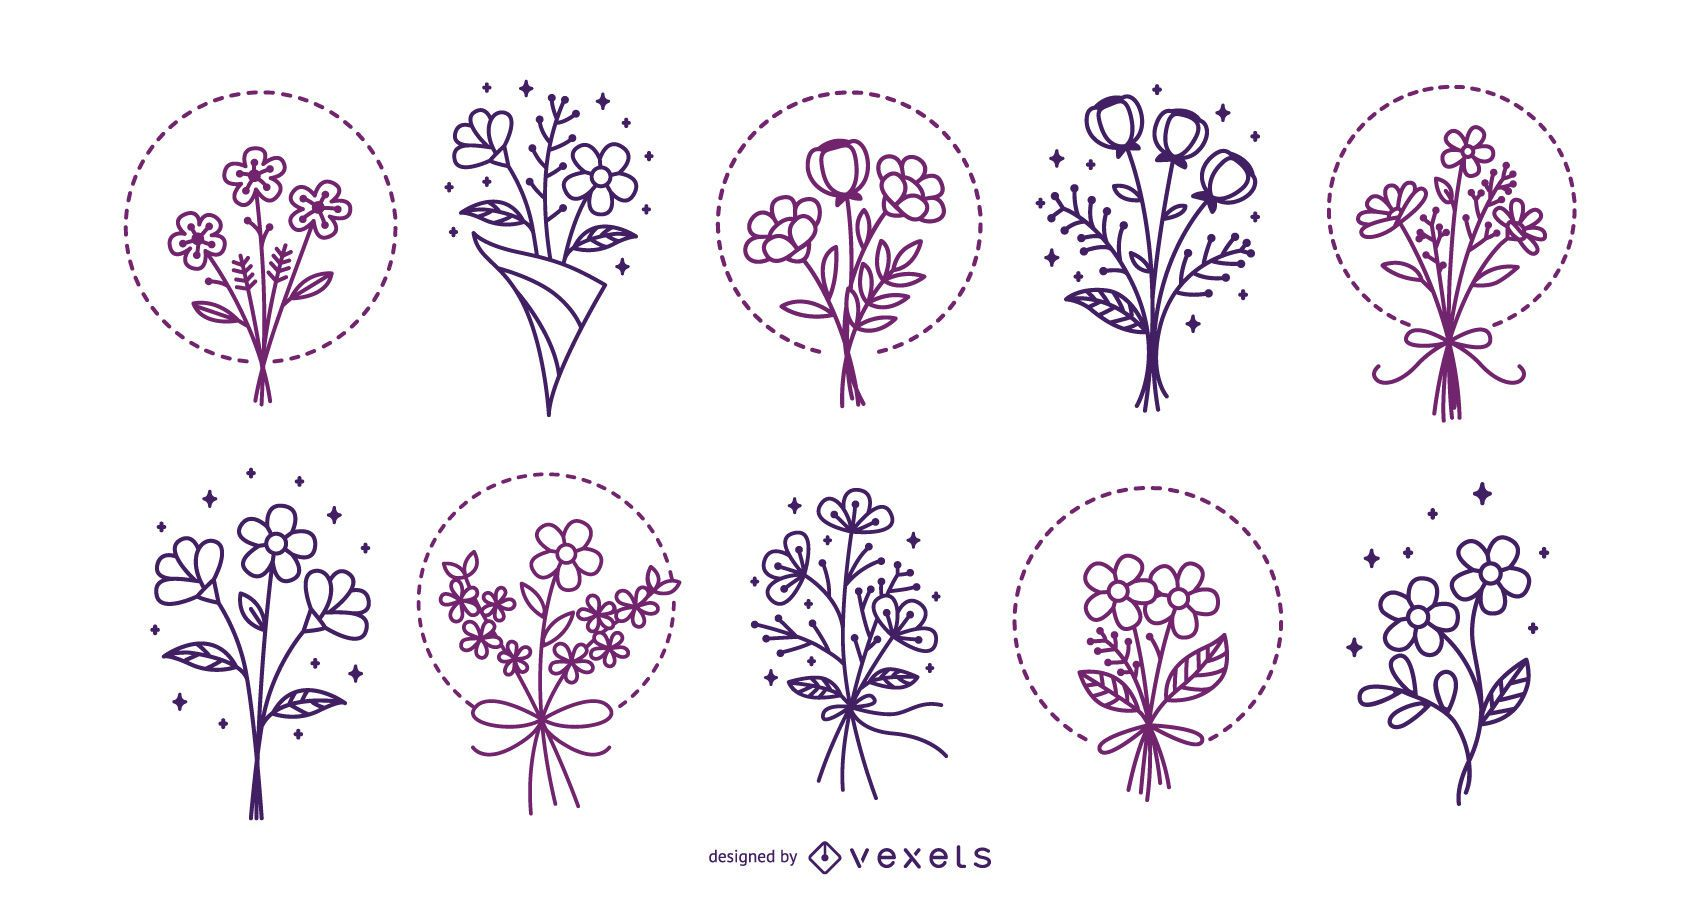 Flower Bouquet Stroke Illustration Pack